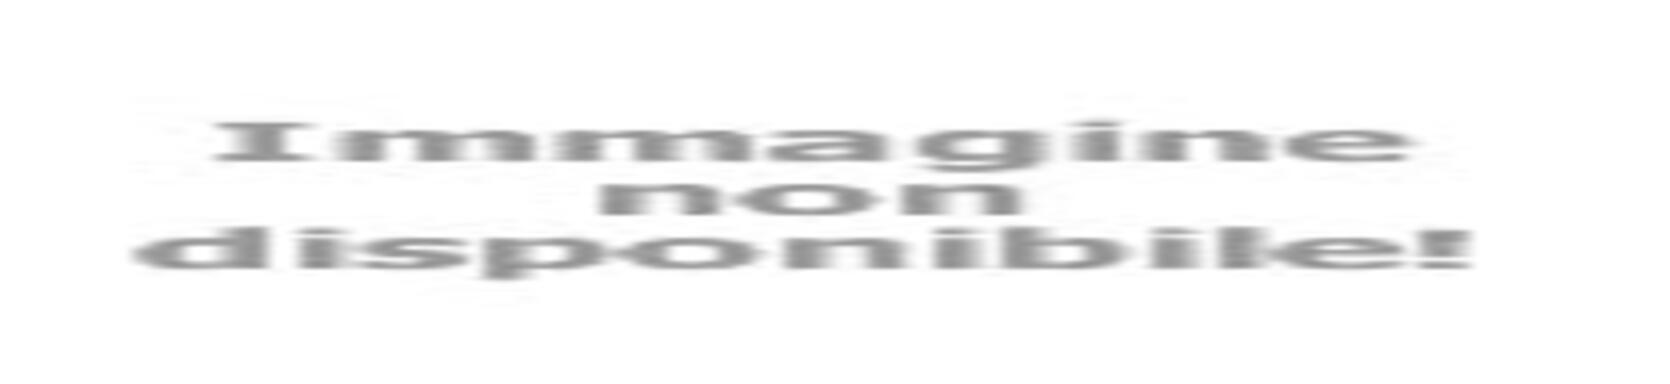 basketriminicrabs it 2-2696-settore-giovanile-u15-ecc-a-straordinaria-vittoria-nel-derby-con-santarcangelo 005